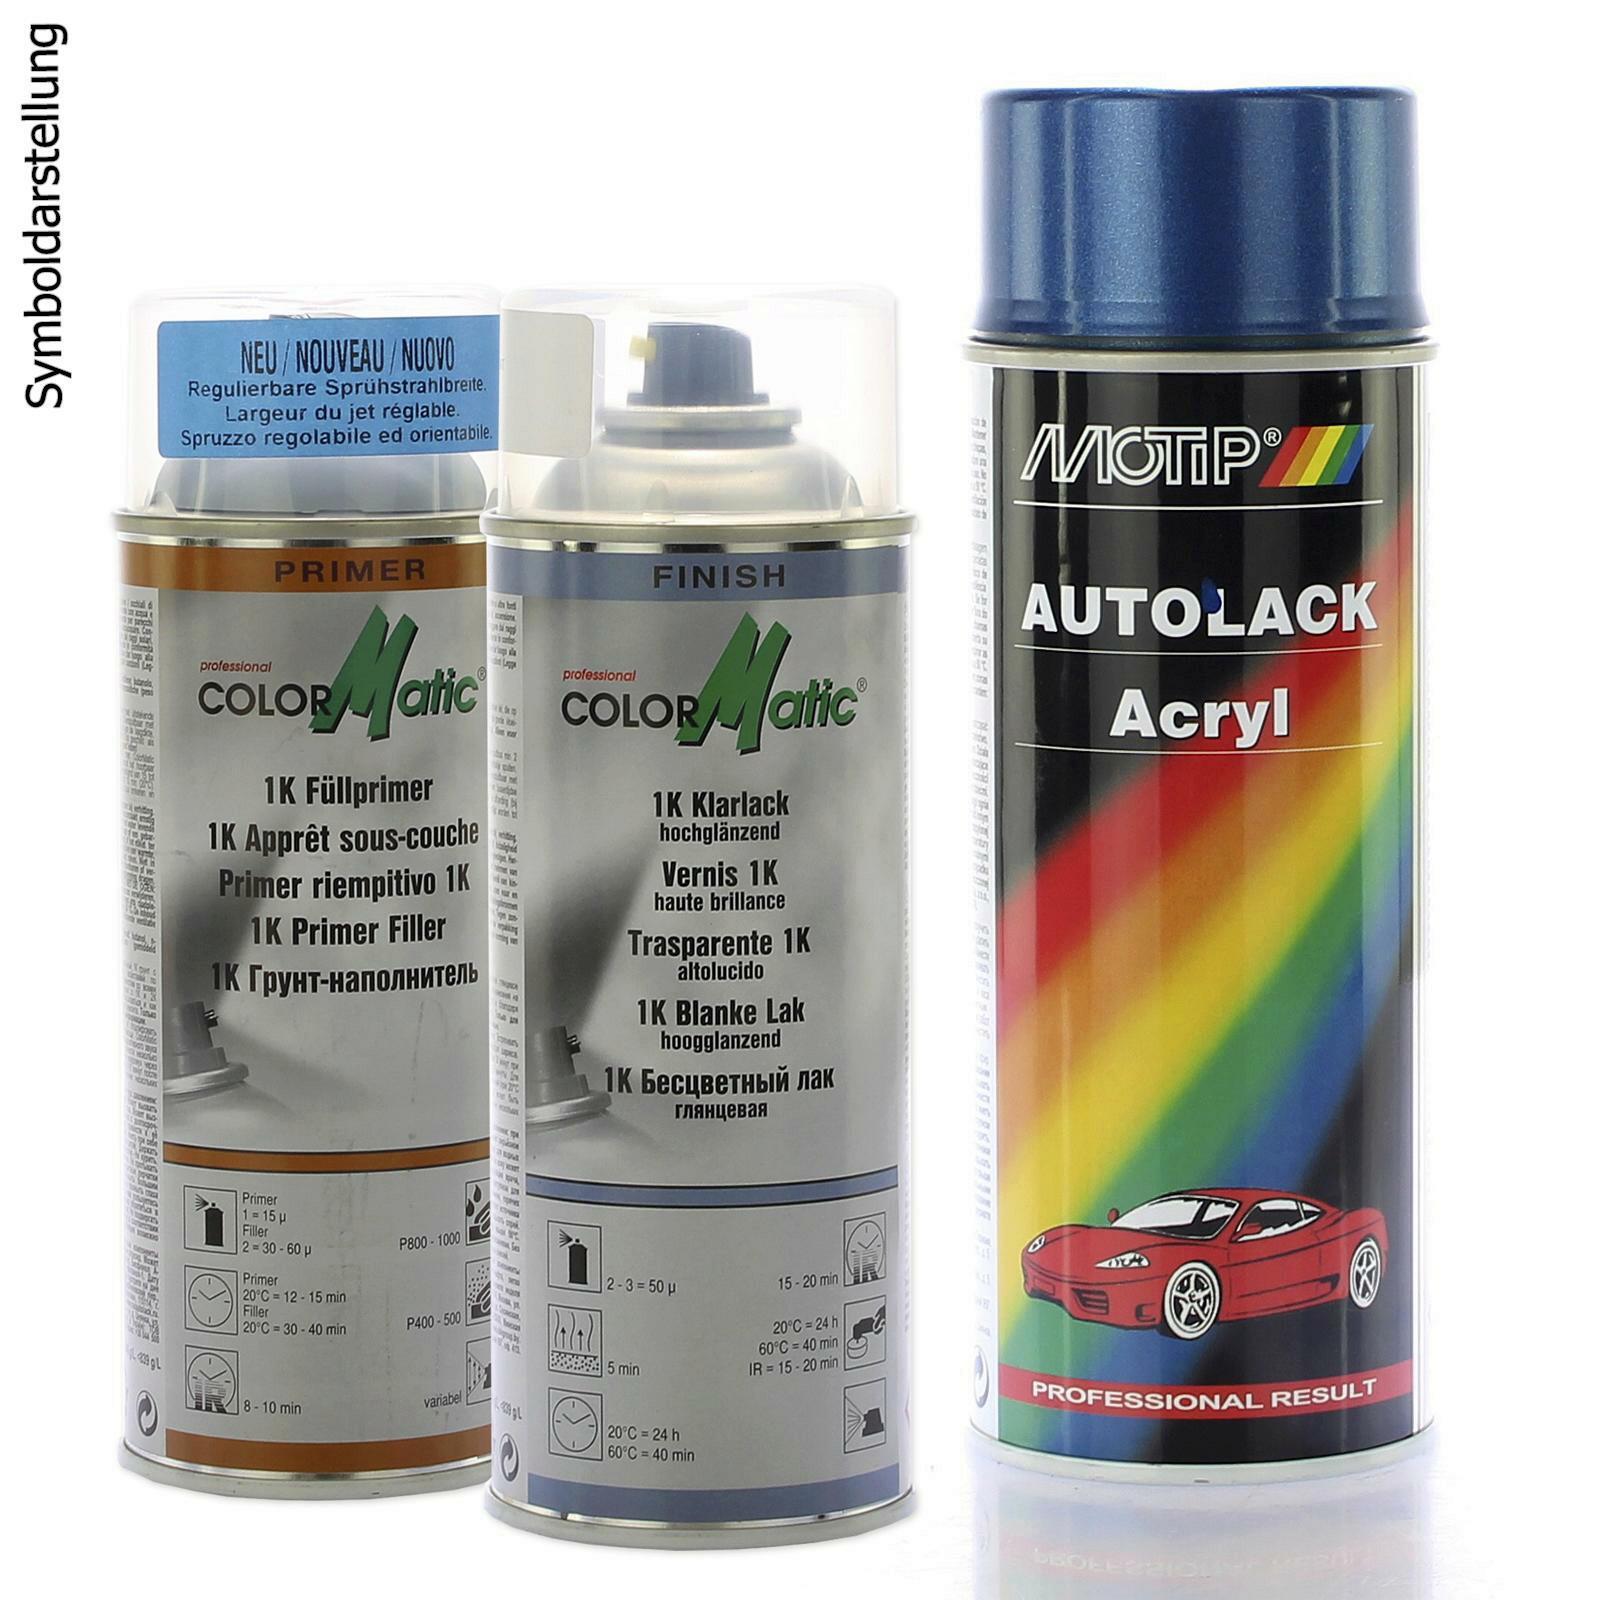 Motip Metallic Lackset Fullprimer HG3 + 1K Klarlack + Fahrzeug-Kombinationslack